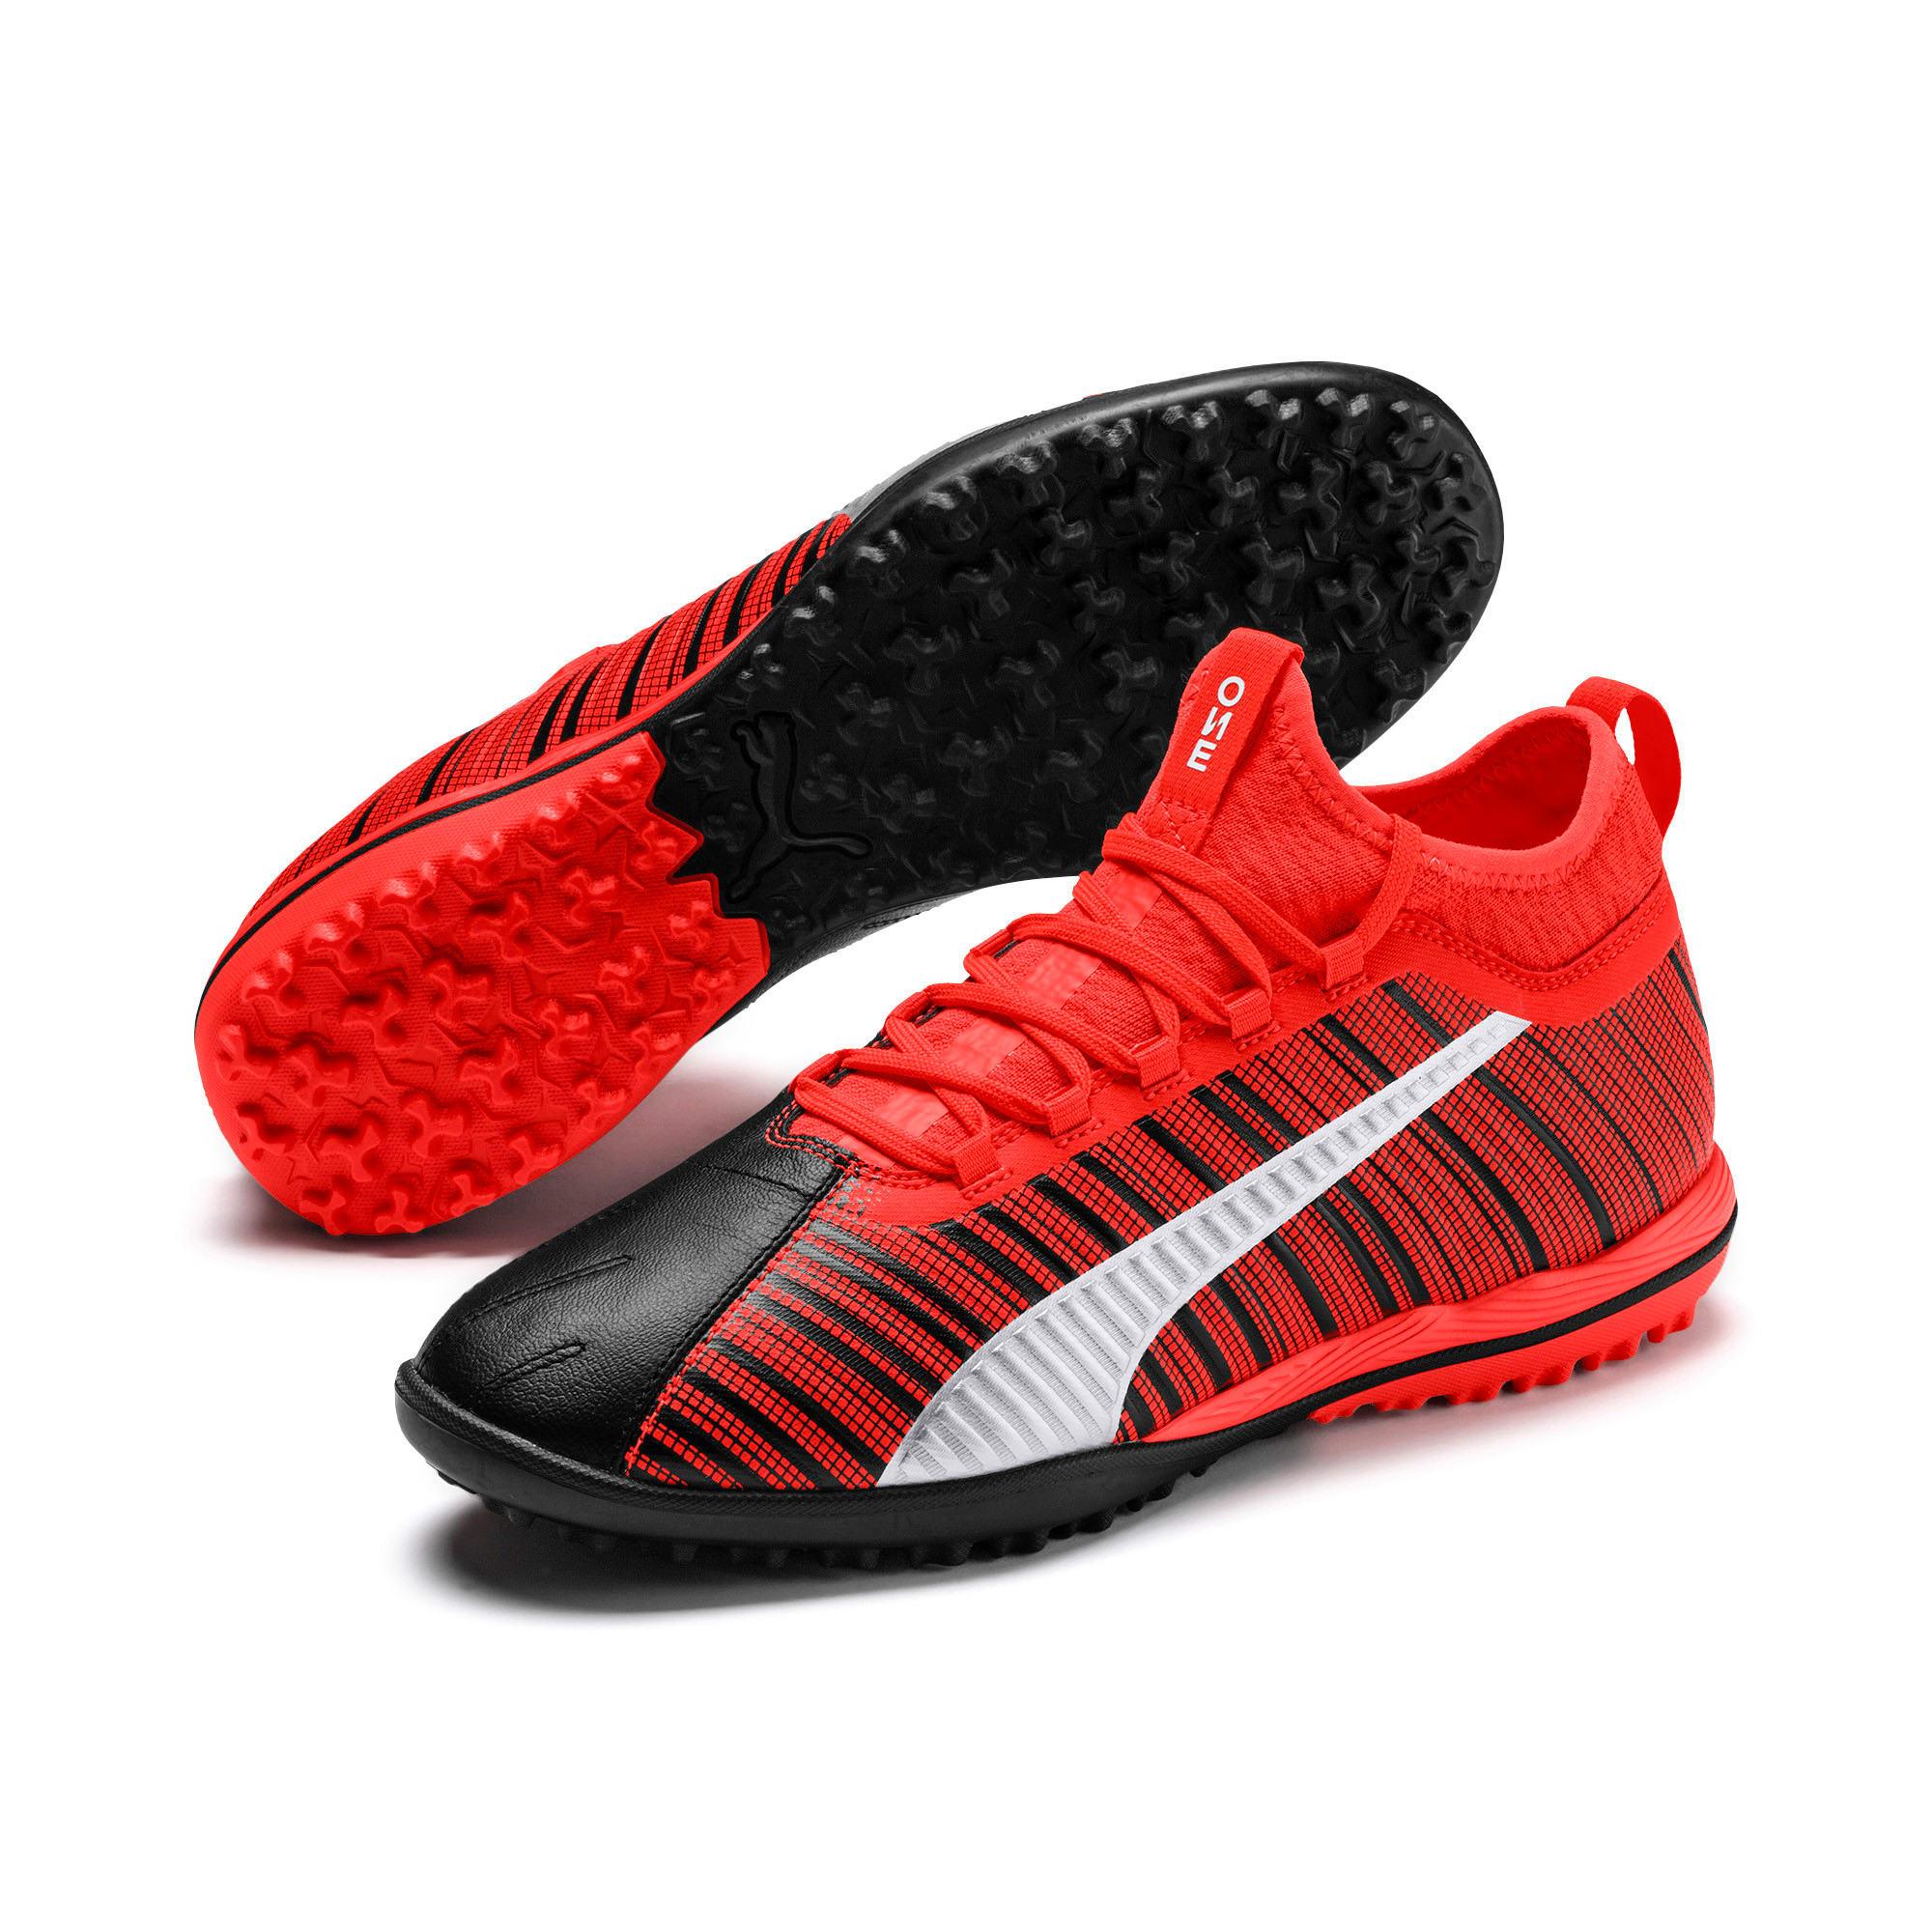 Thumbnail 3 of PUMA ONE 5.3 TT Men's Soccer Shoes, Black-Nrgy Red-Aged Silver, medium